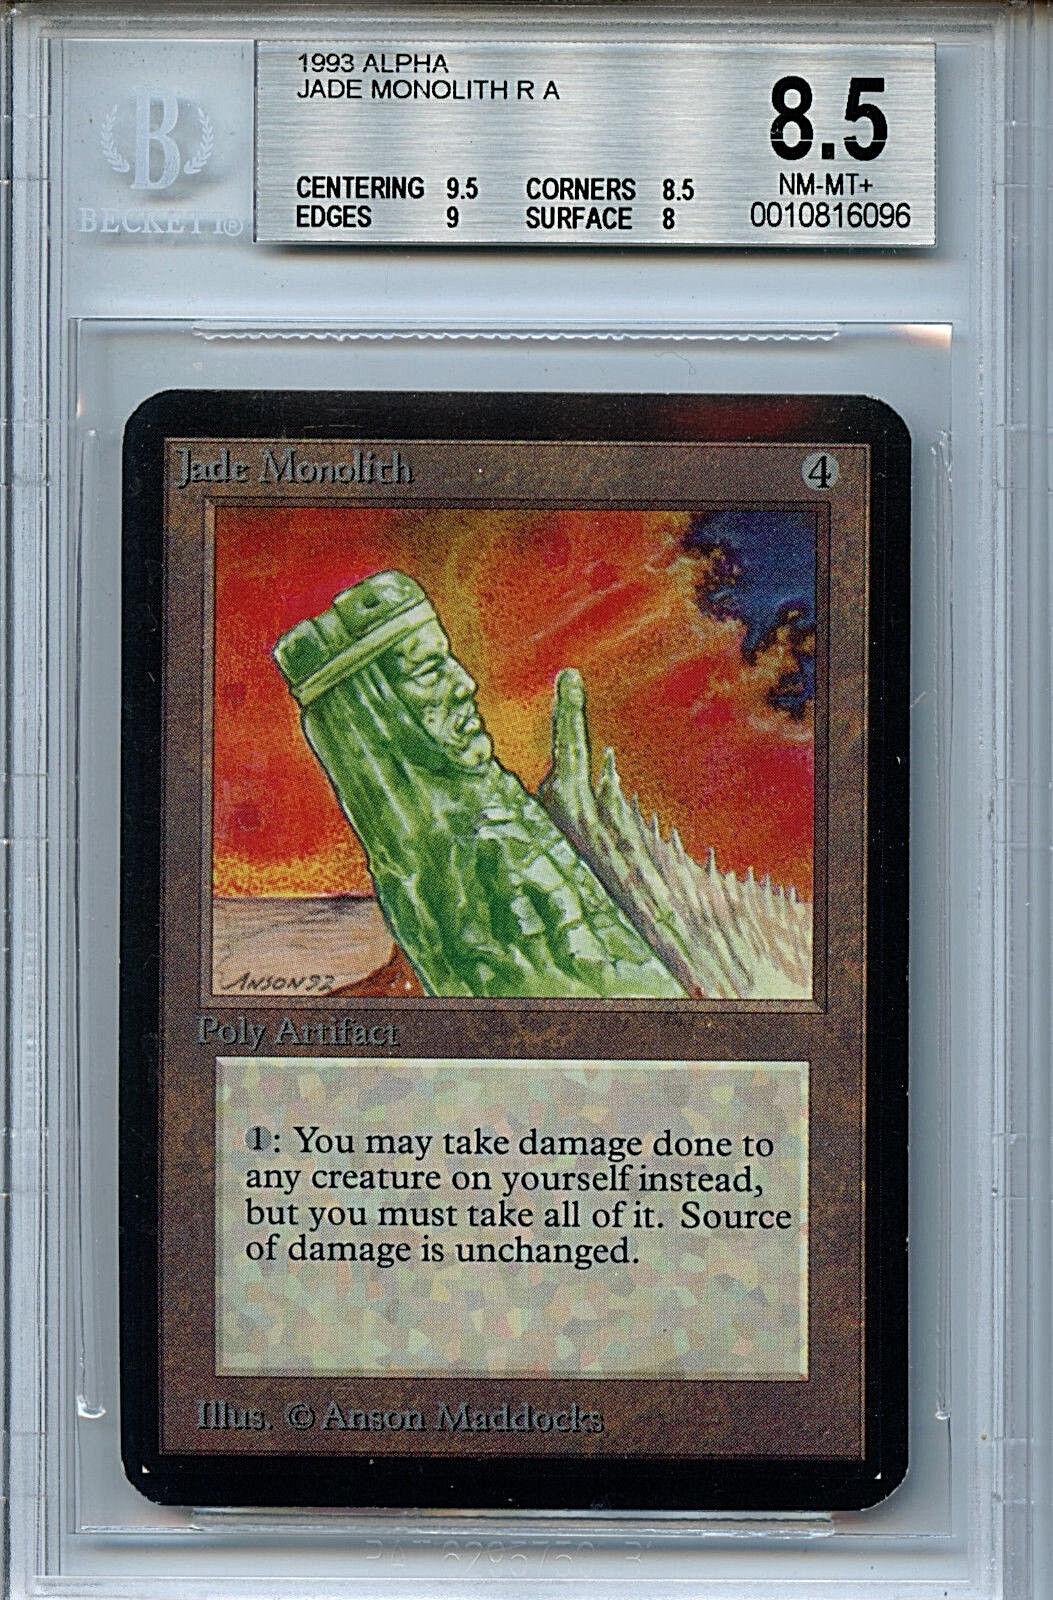 MTG Alpha Jade Monolith Monolith Monolith BGS 8.5 NM-MT+ Card Magic Amricons 6096 264208